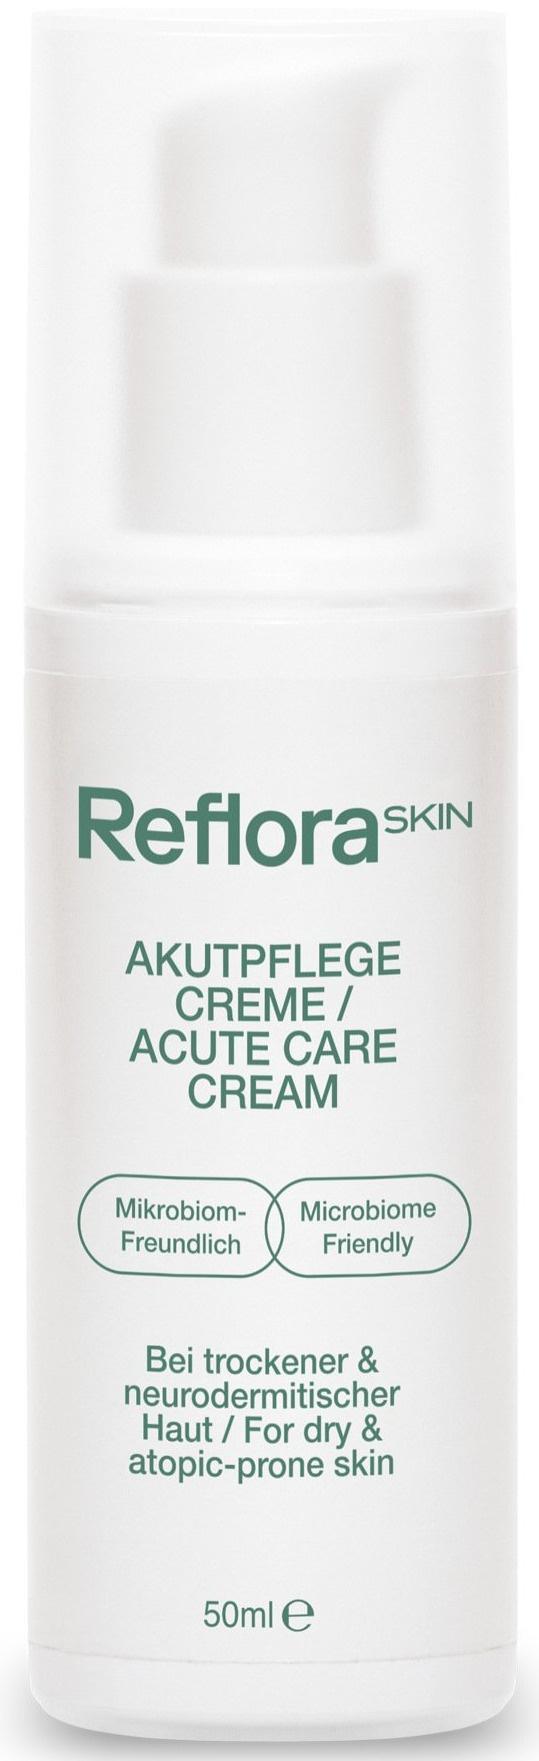 Reflora Skin Akutpflege Creme / Acute Care Cream